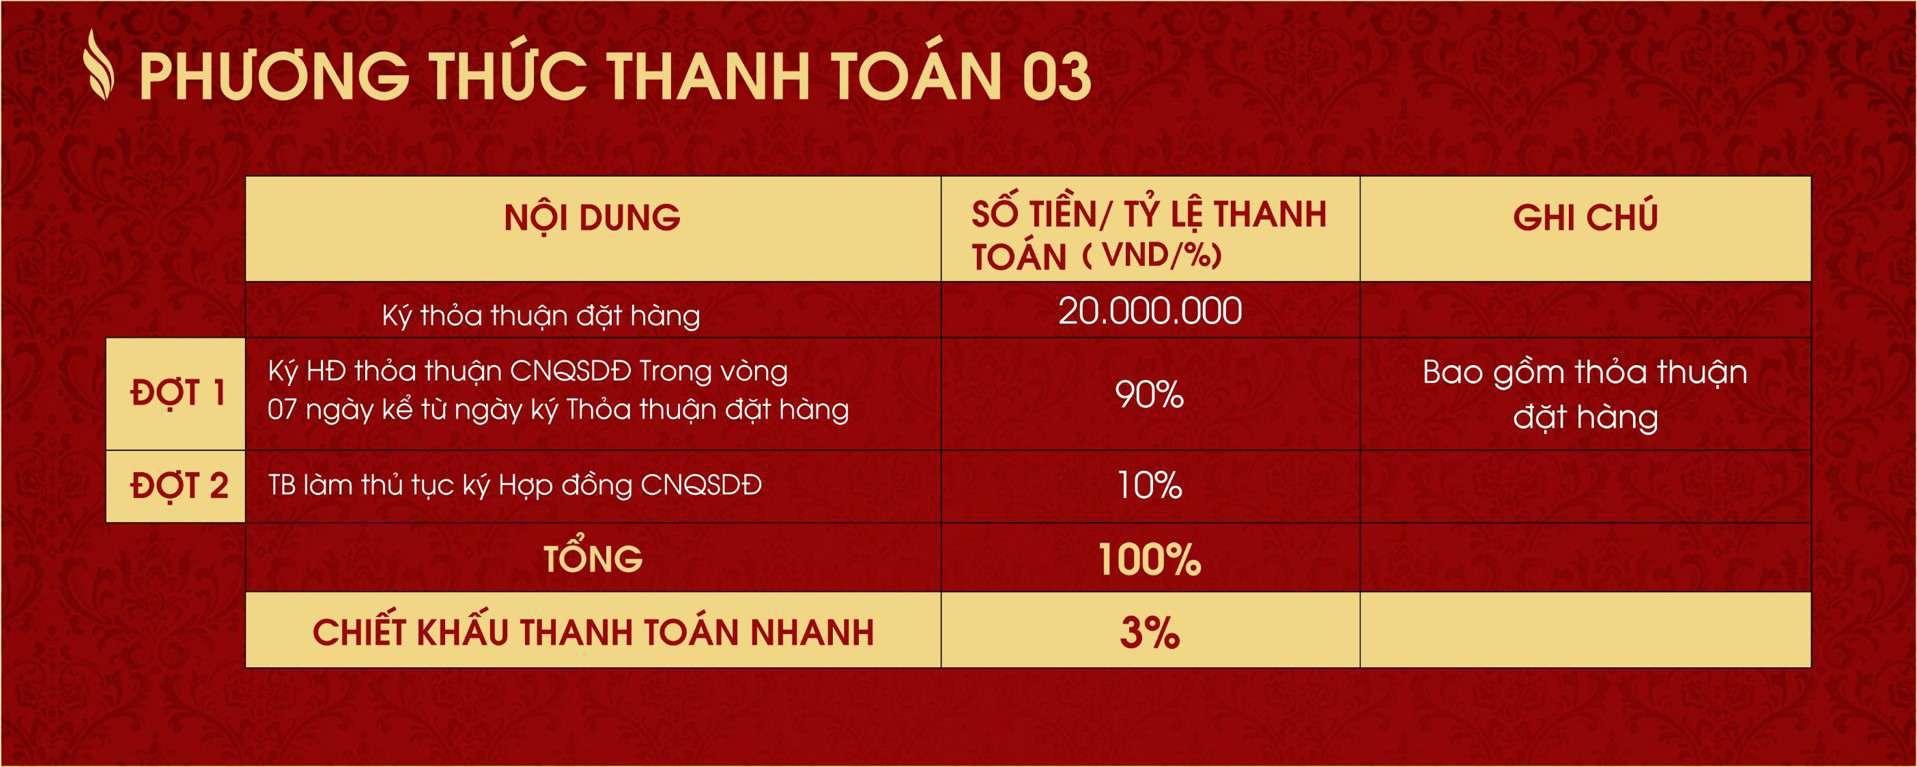 phuong thuc tt 3